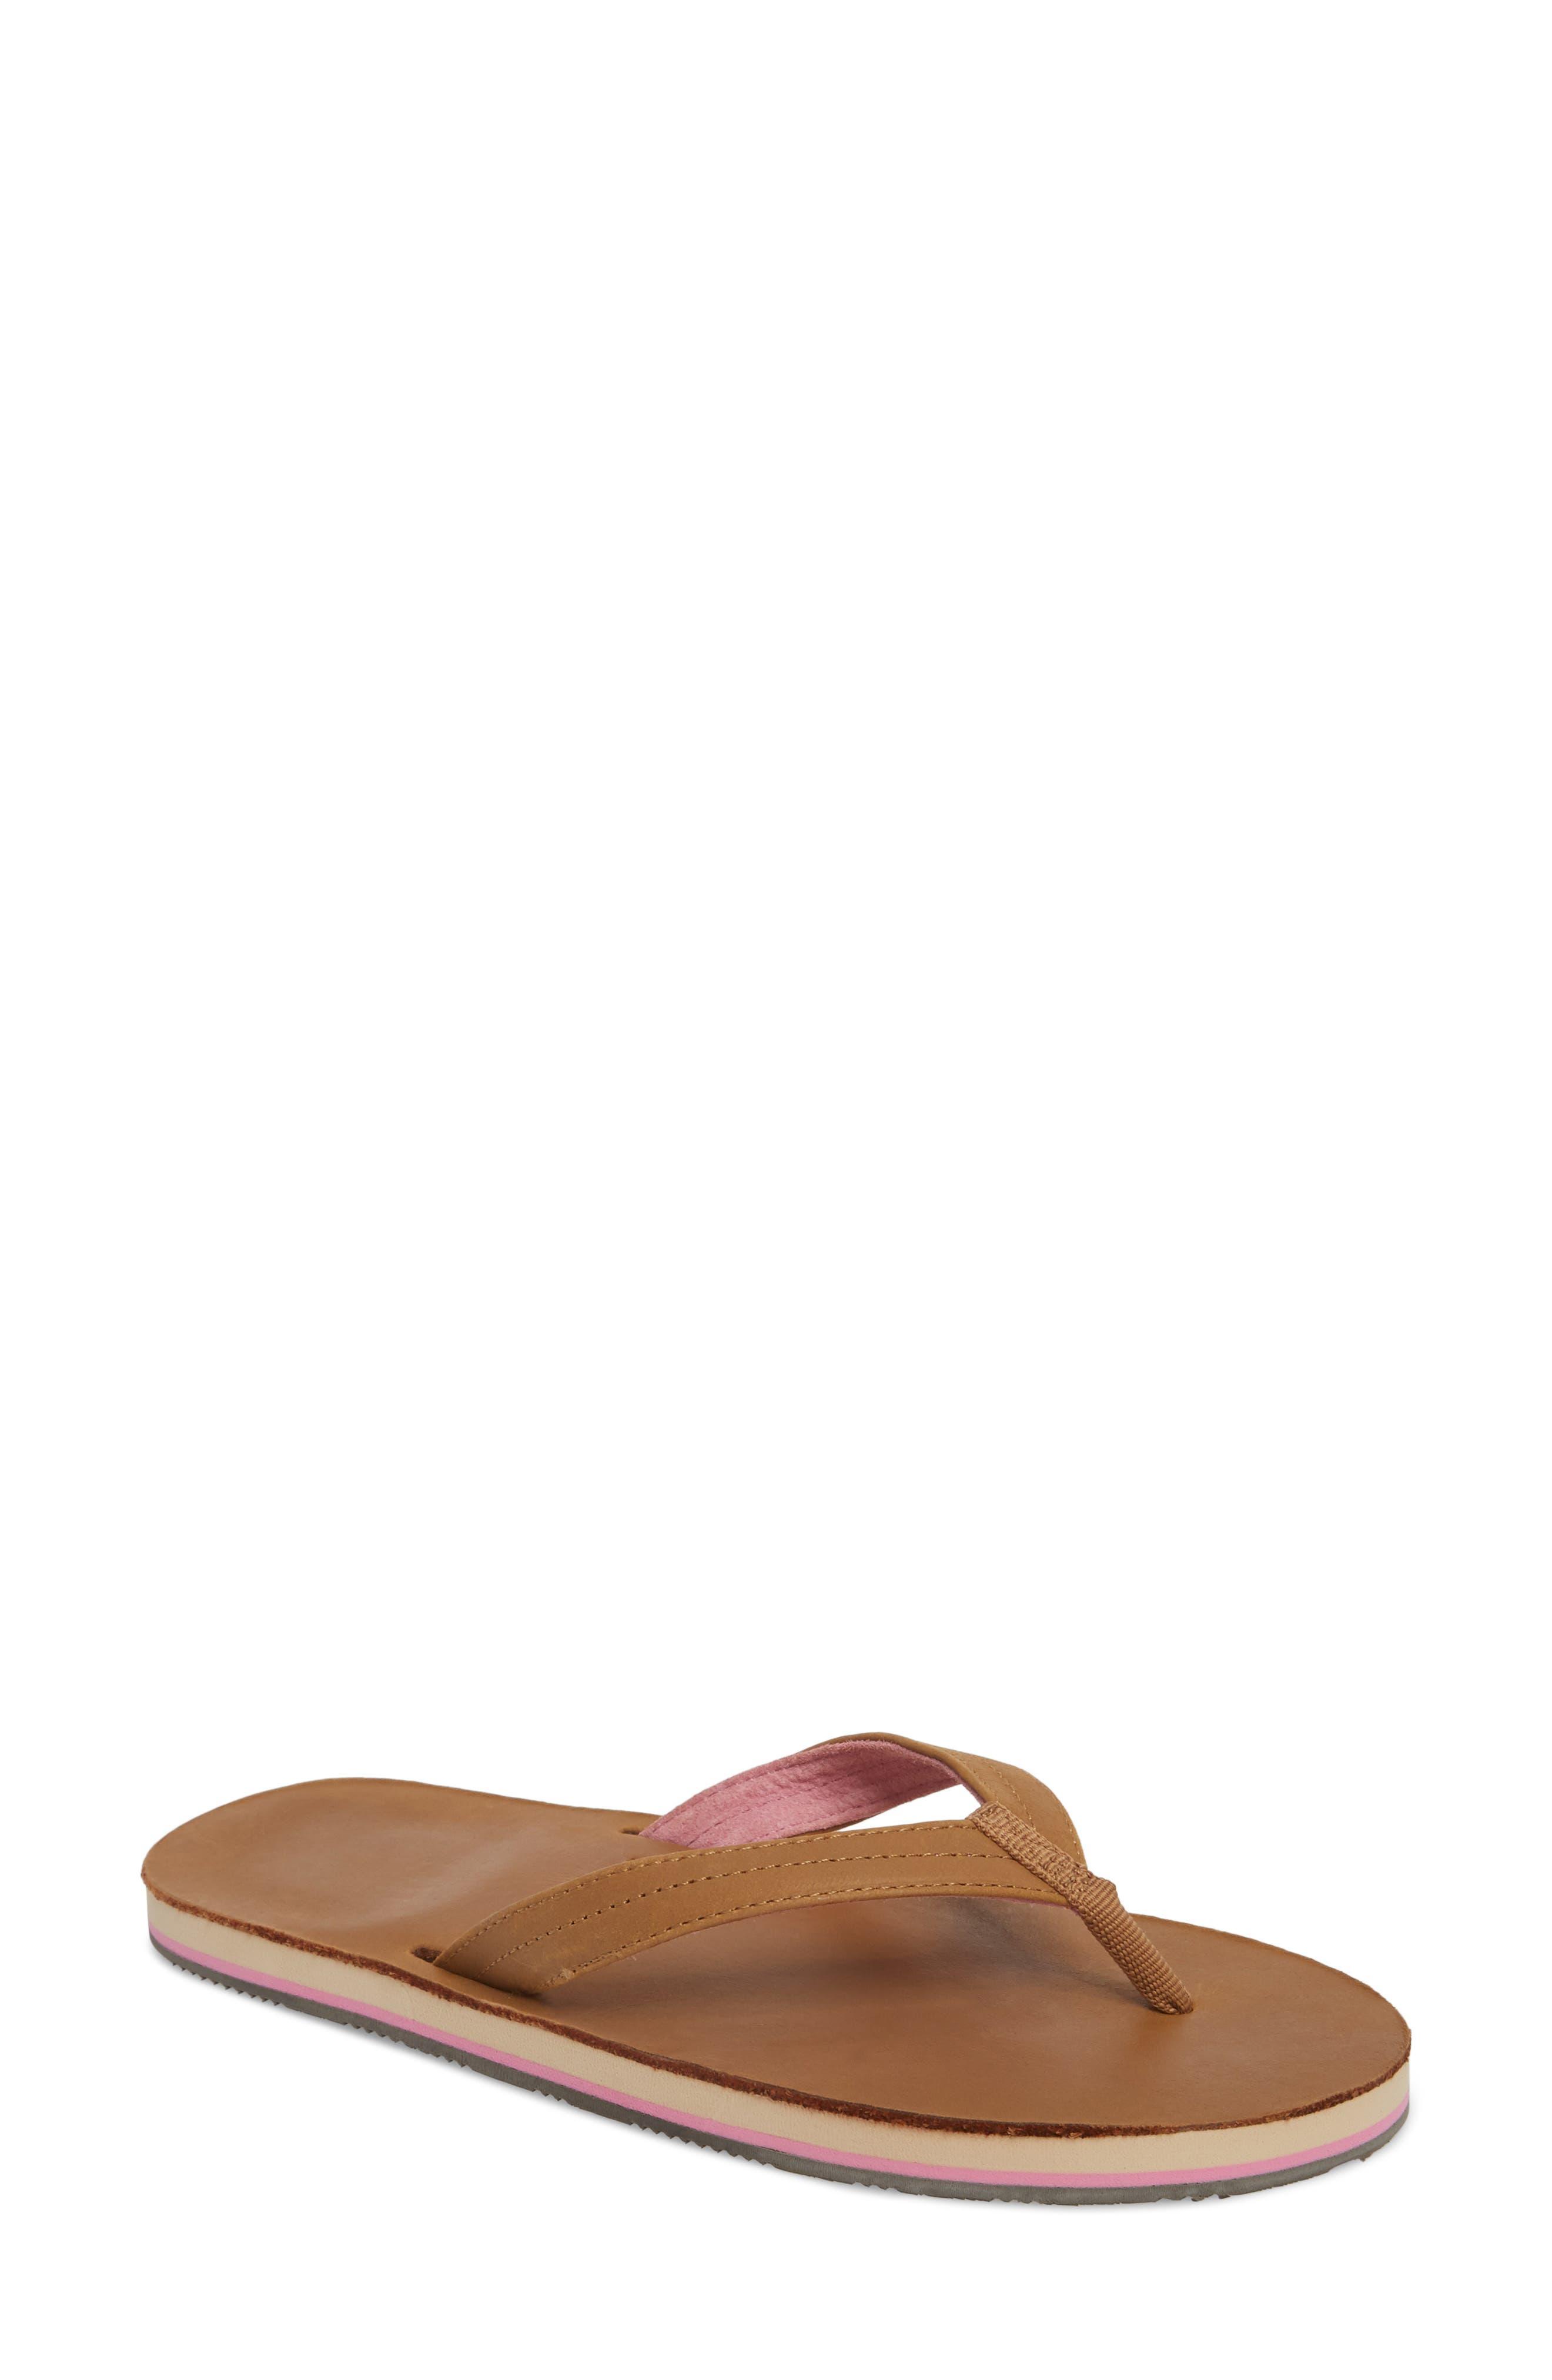 Lakes Flip Flop,                         Main,                         color, Tan Pink